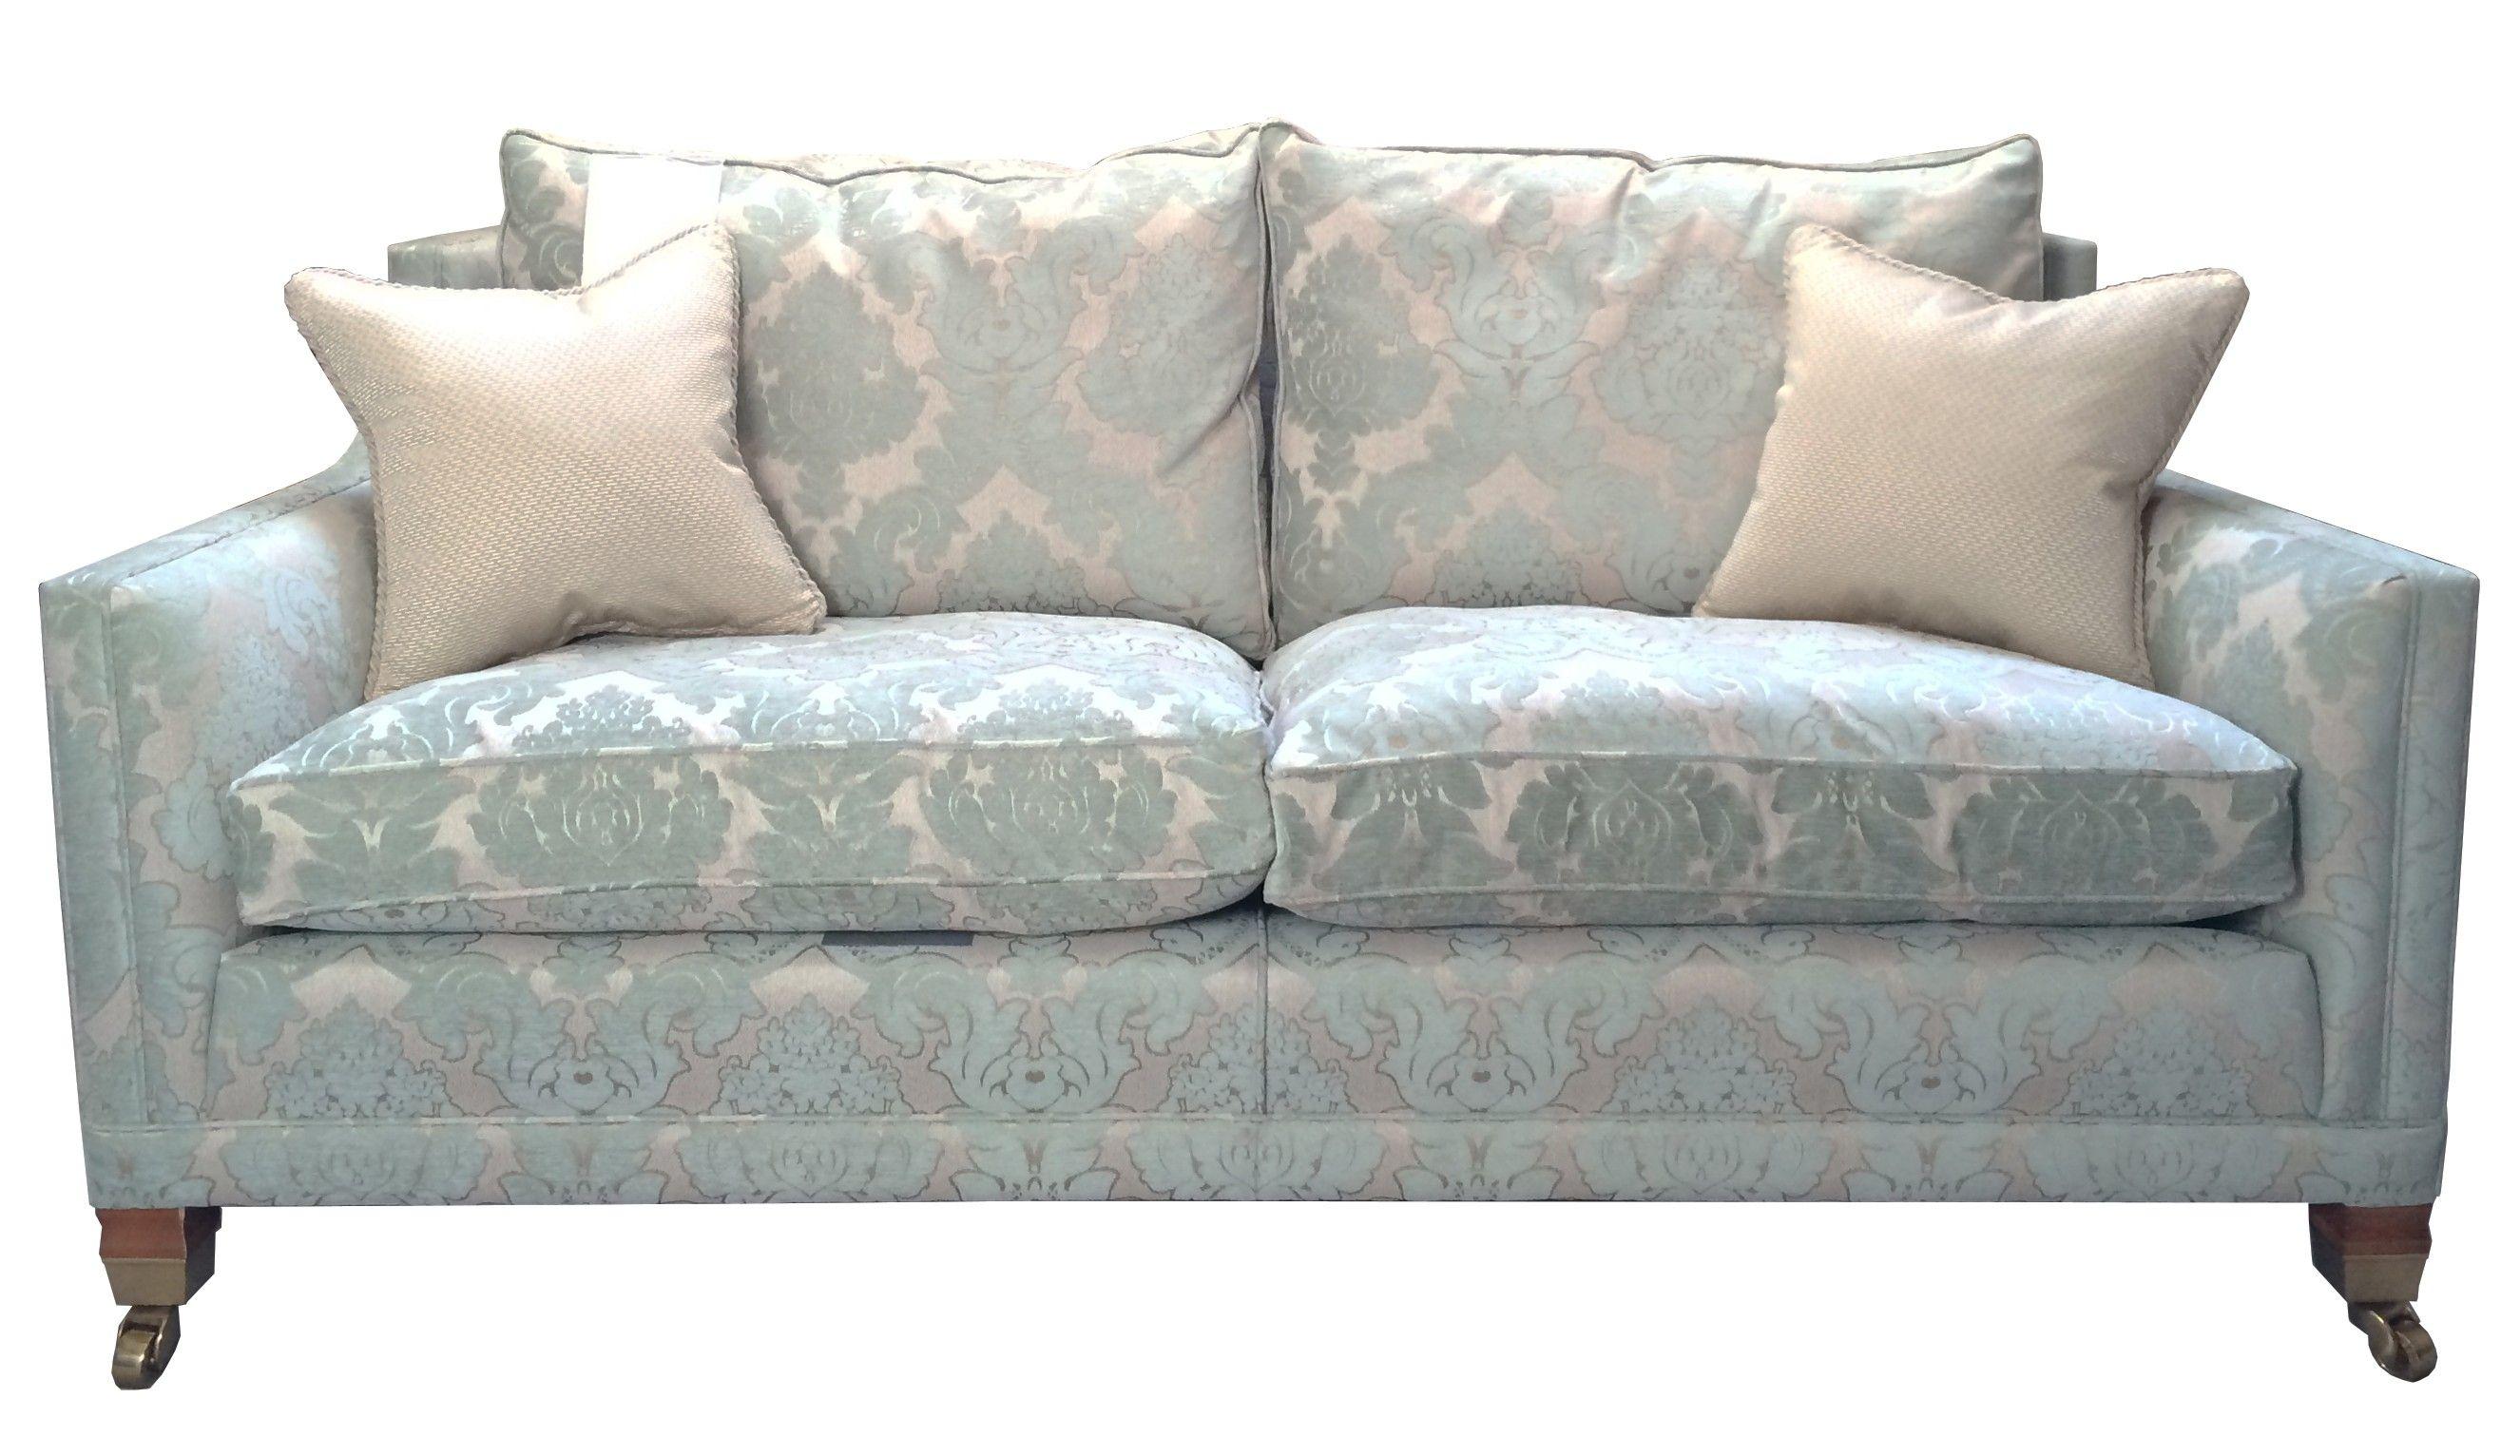 clearance sofa beds uk small end tables duresta villeneuve medium lounge